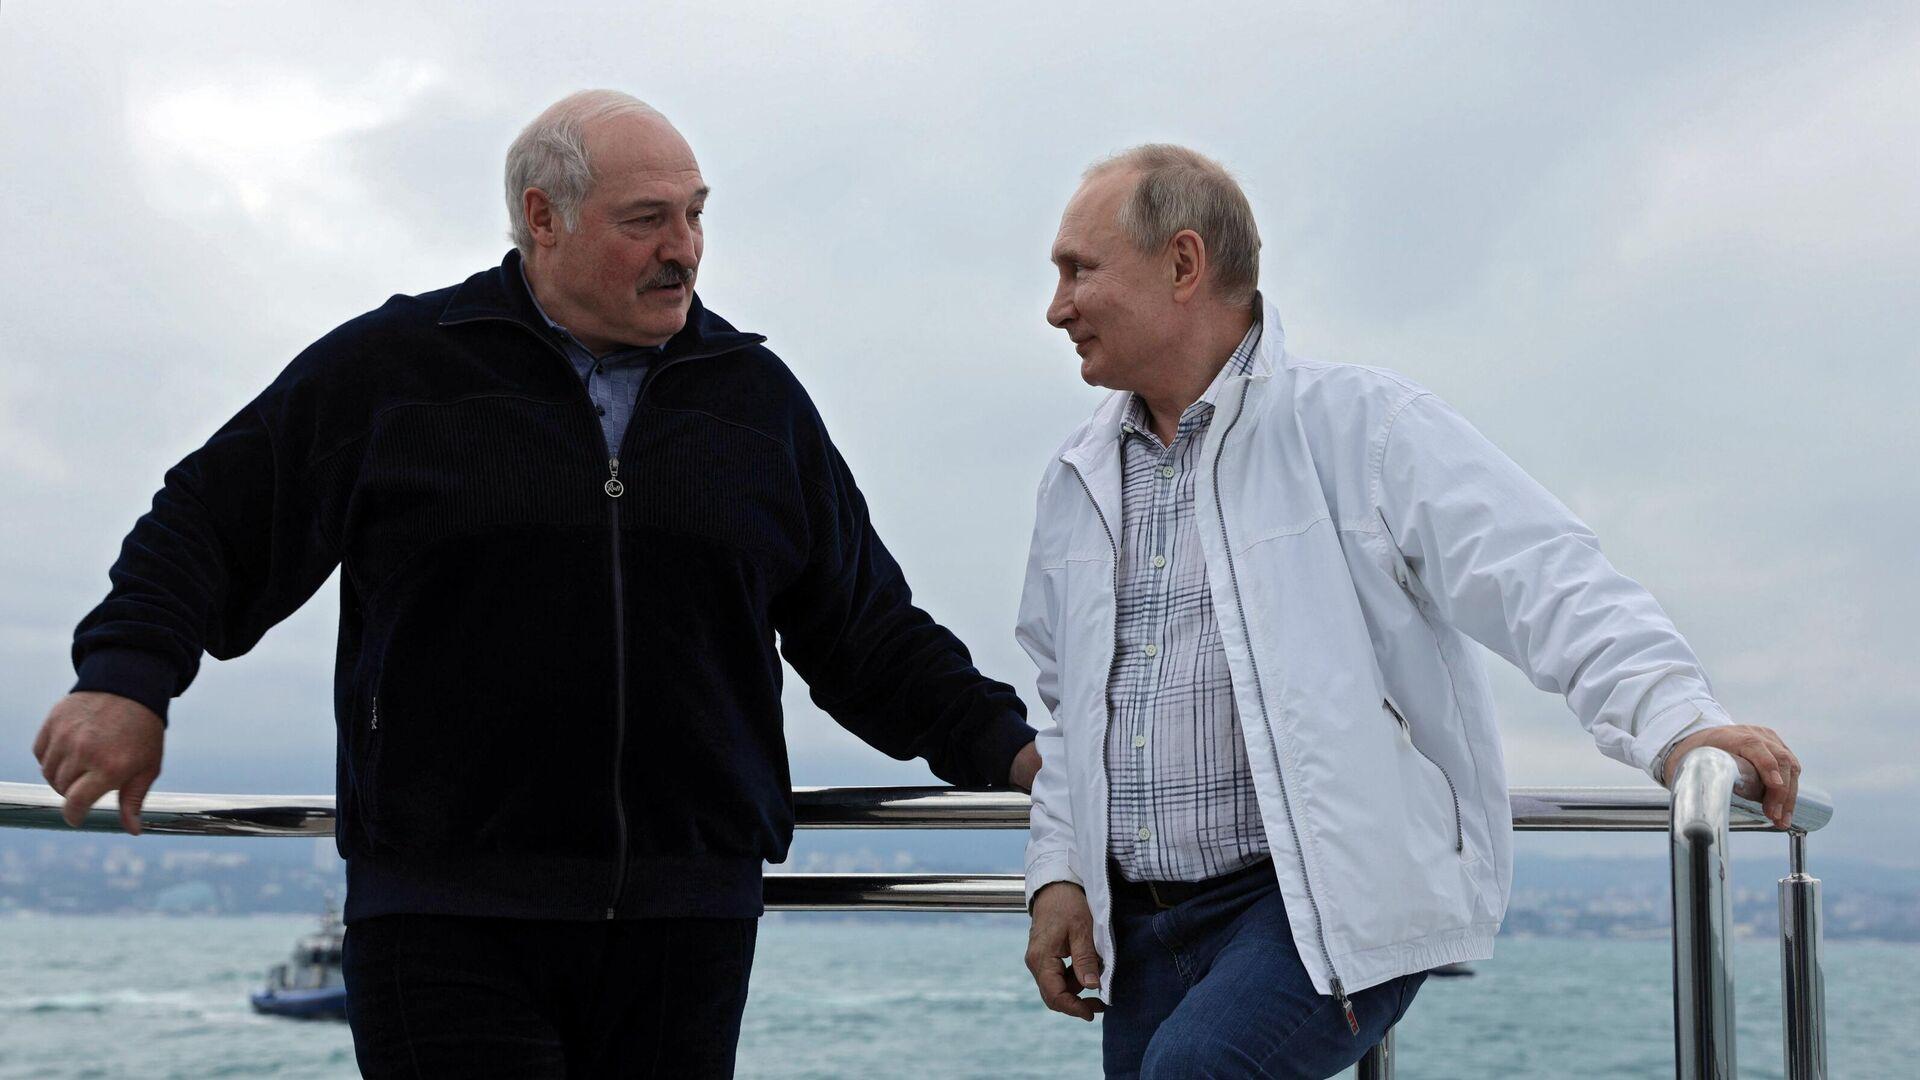 Президент РФ Владимир Путин и президент Белоруссии Александр Лукашенко во время морской прогулки - РИА Новости, 1920, 29.05.2021